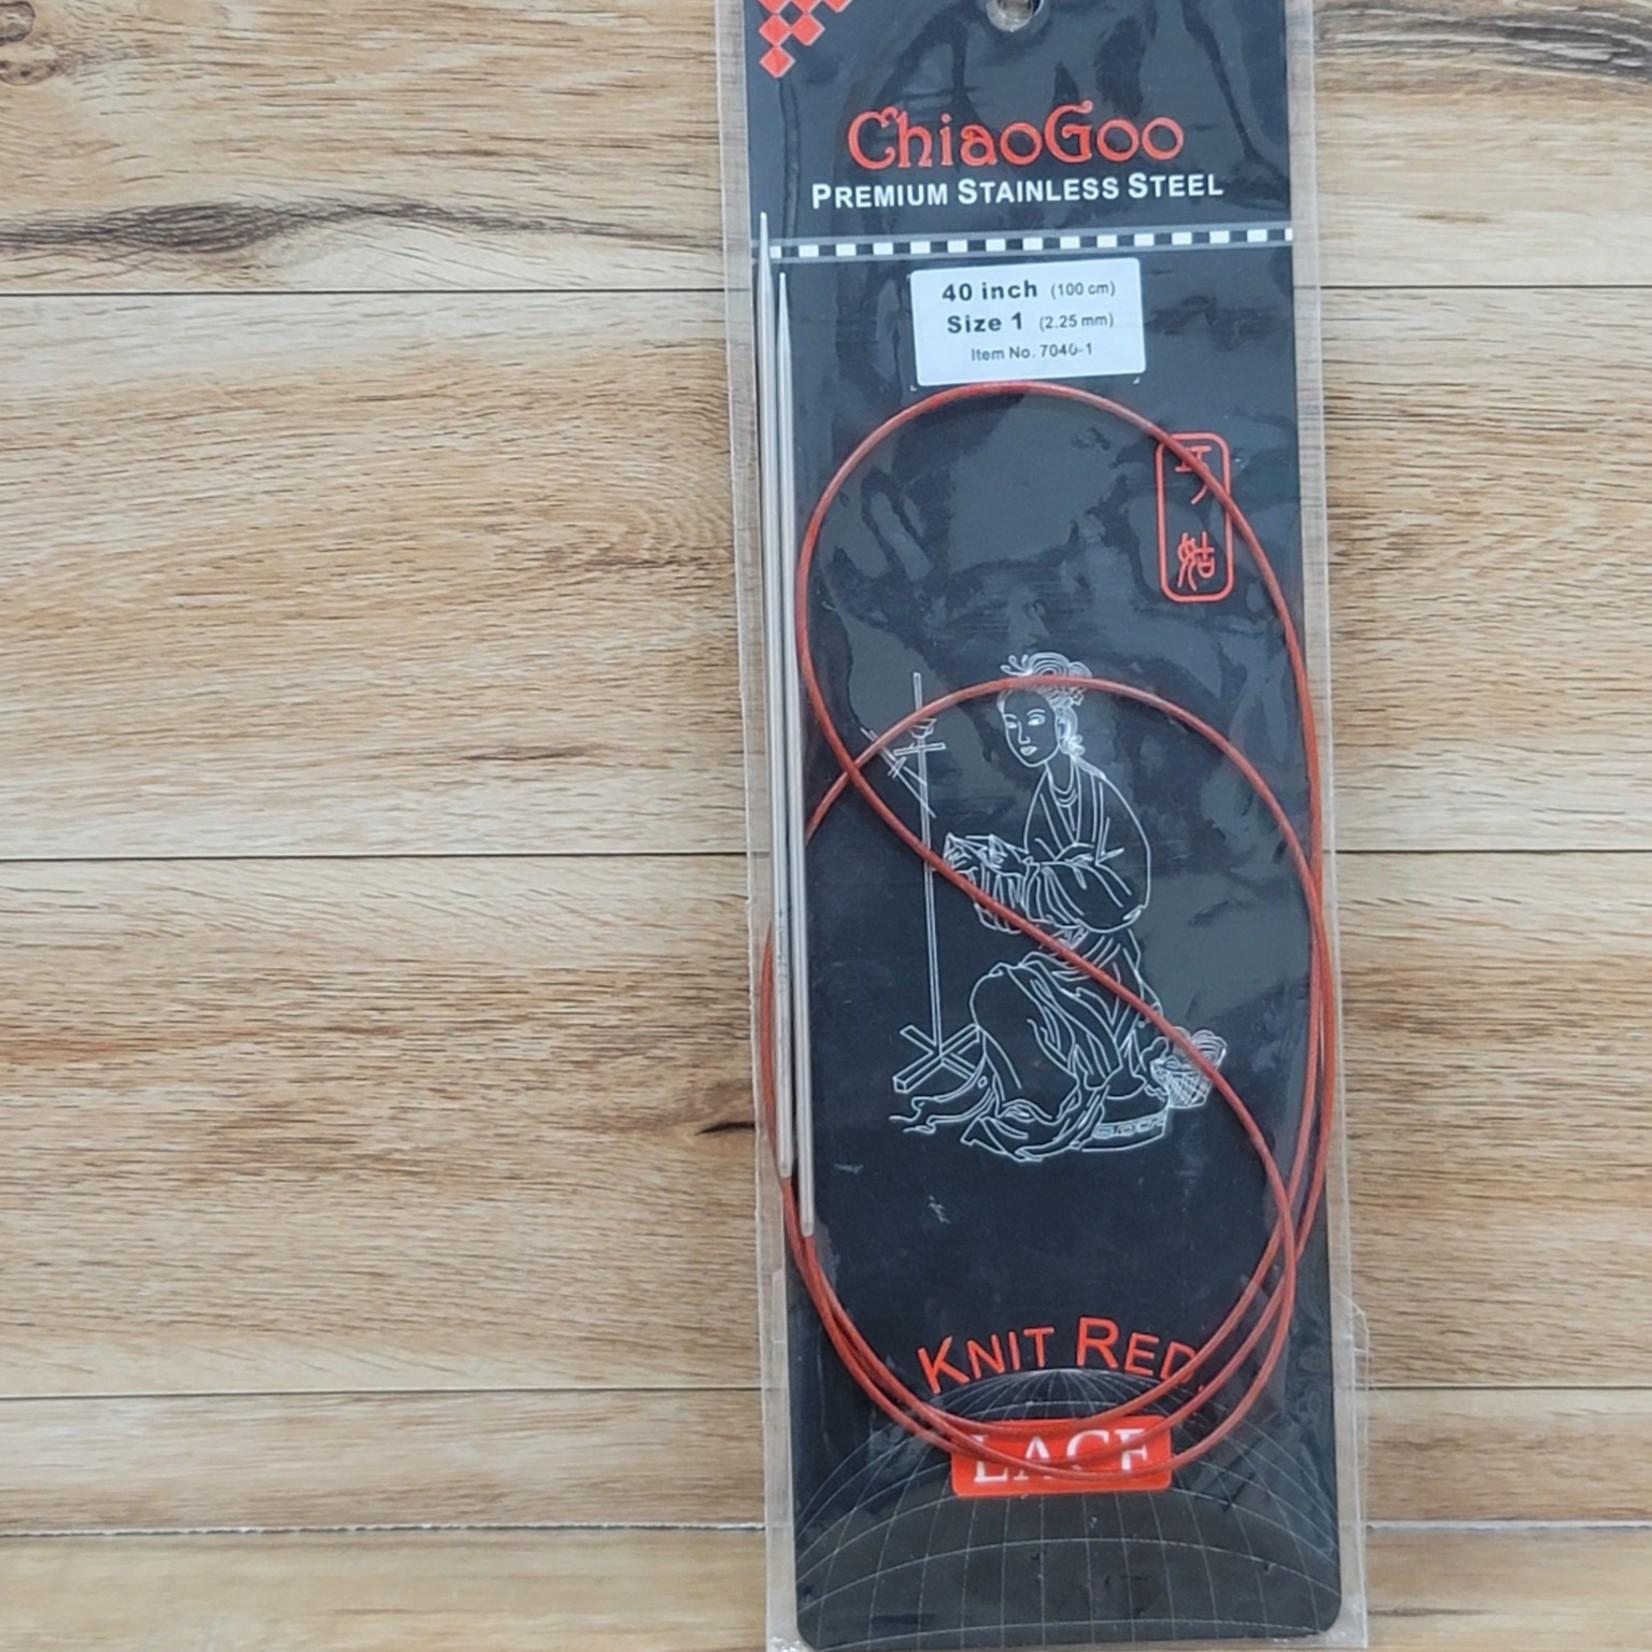 ChiaoGoo - Red Circular Knitting Needles - 40 inch Size 1 (2.25mm)